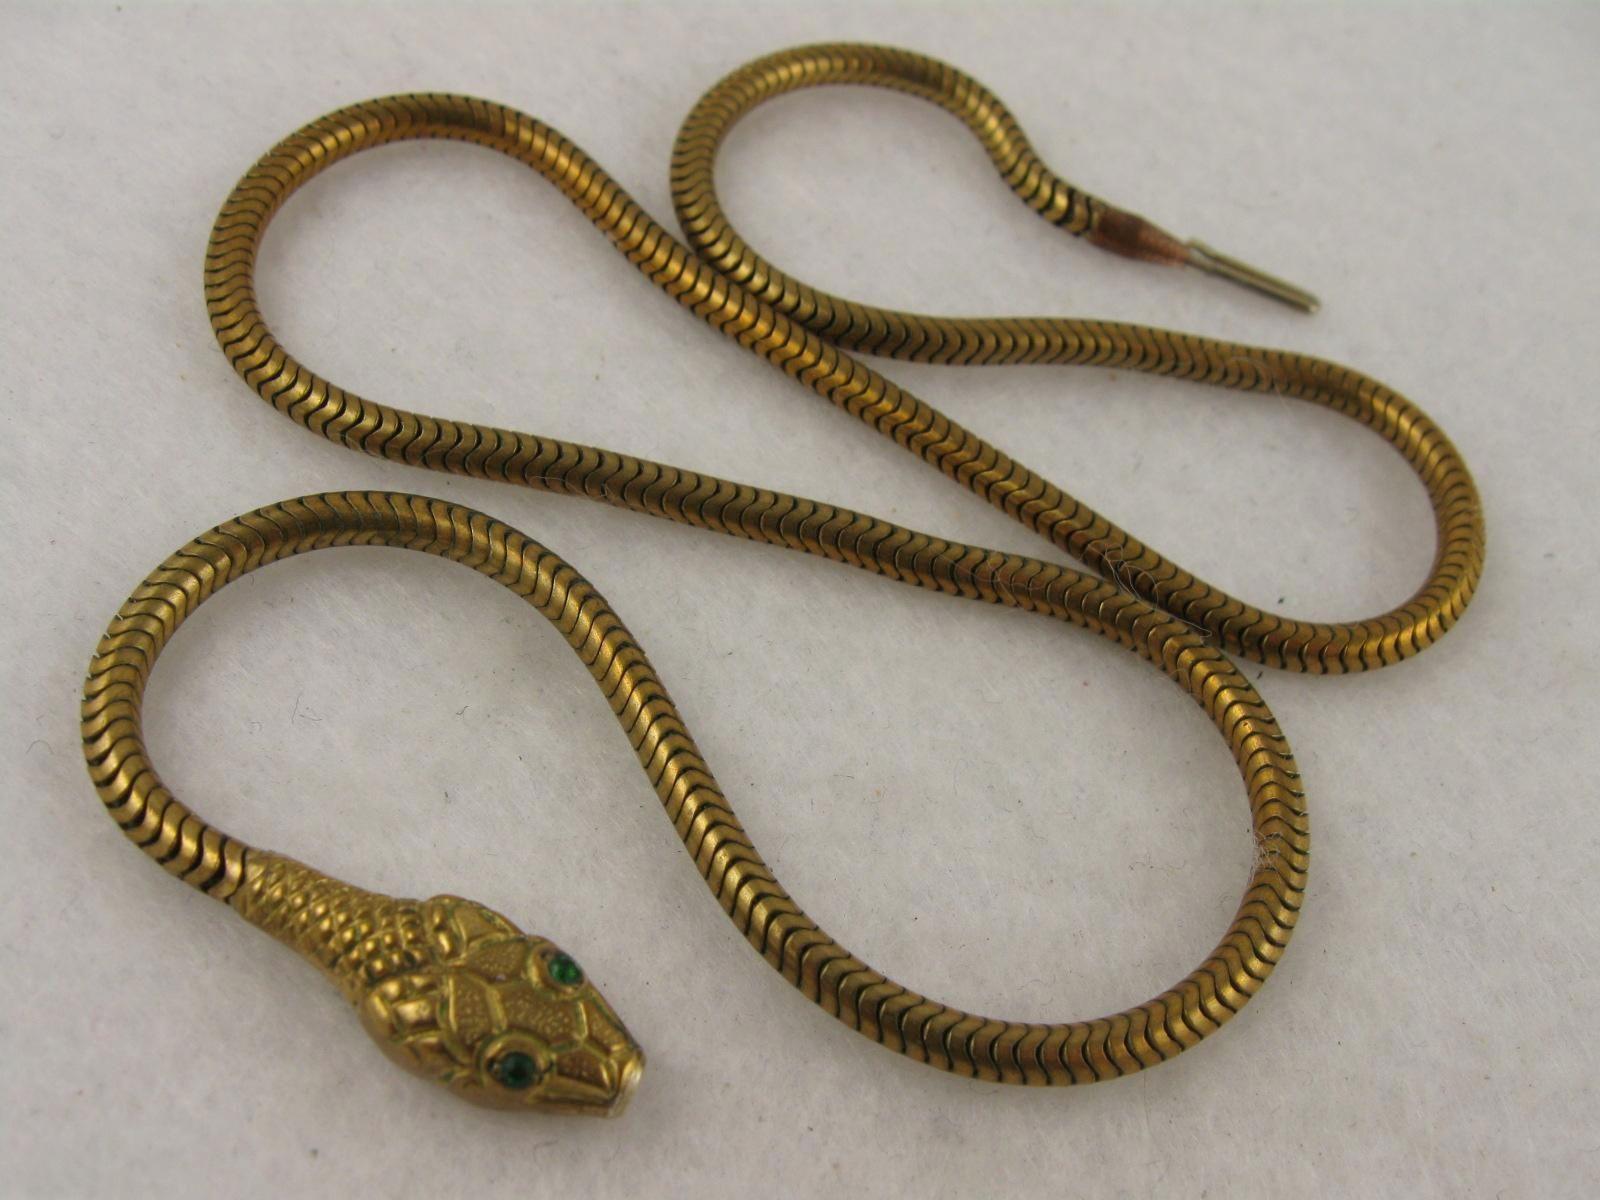 antique snake collar necklace emerald paste